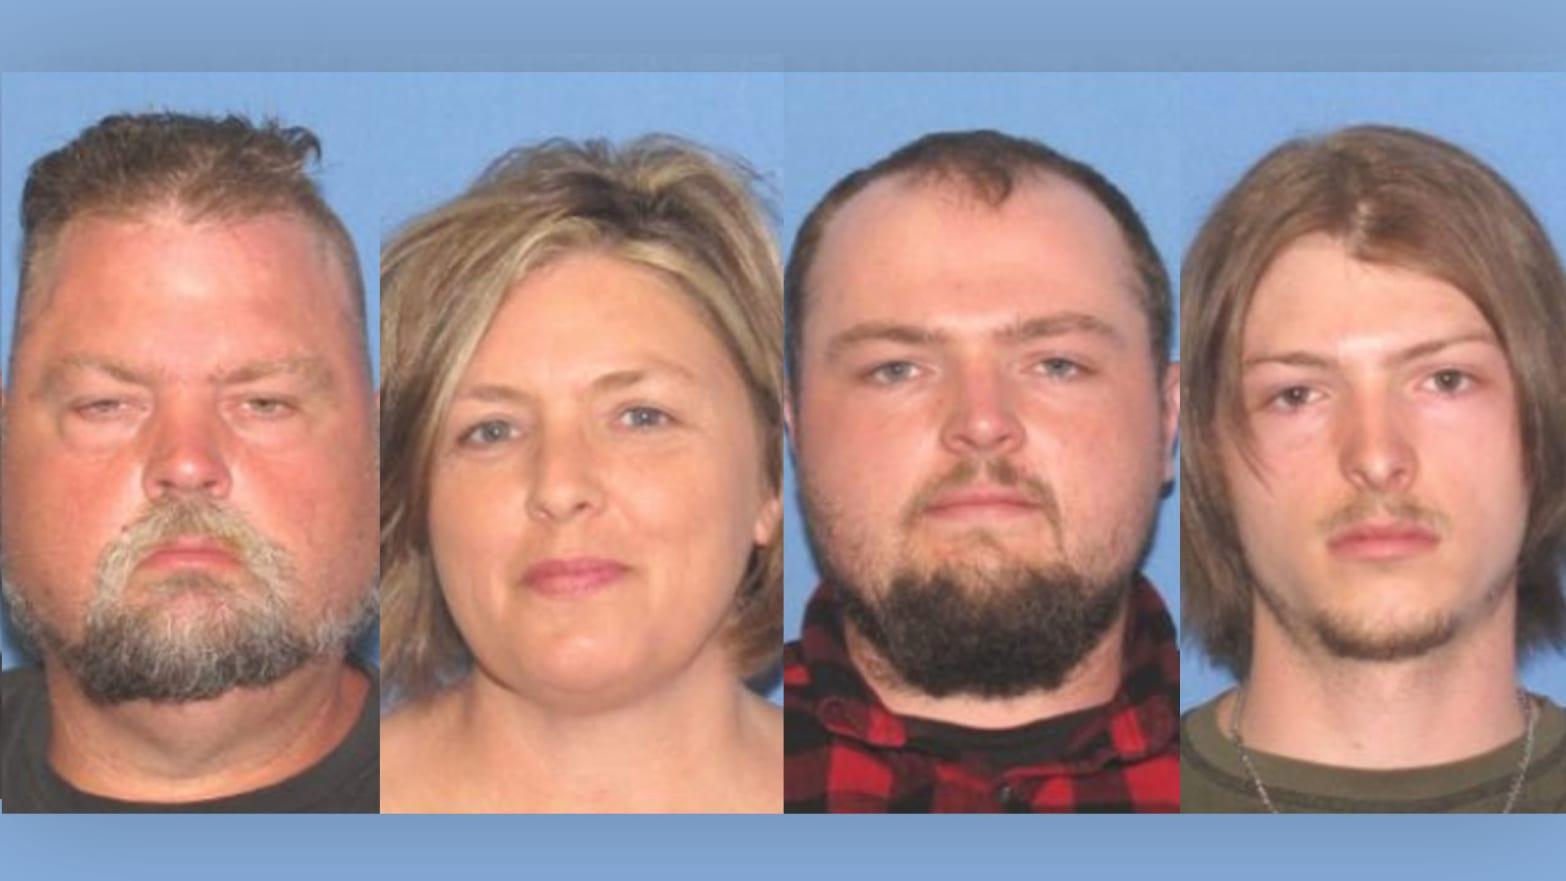 Rhoden Family Massacre: Custody Battle Led to Murder of Entire Ohio